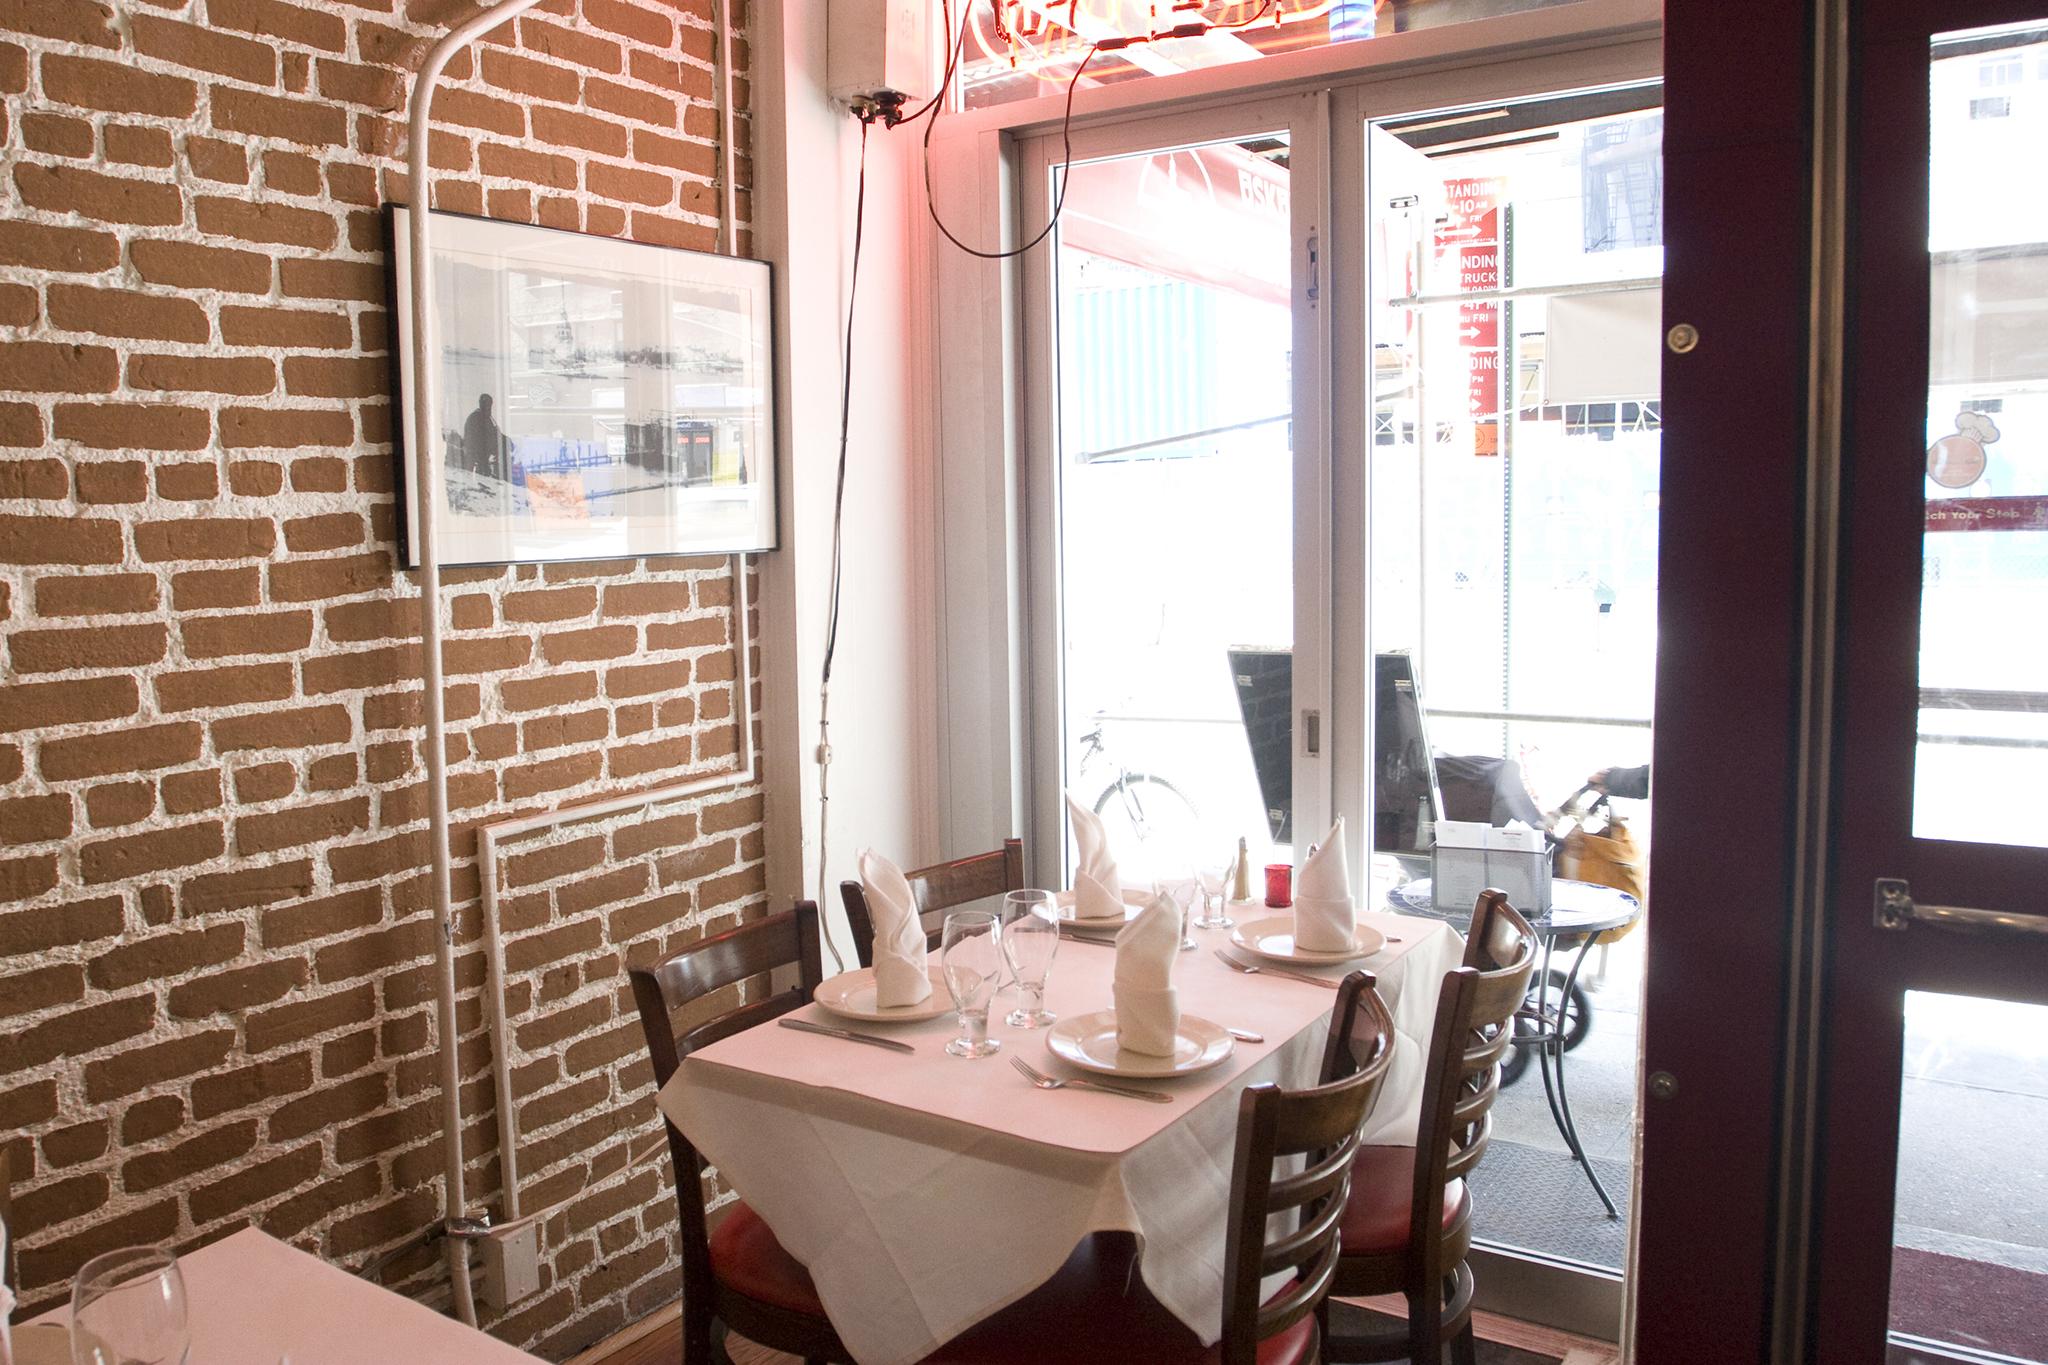 Best Turkish Restaurant Upper East Side